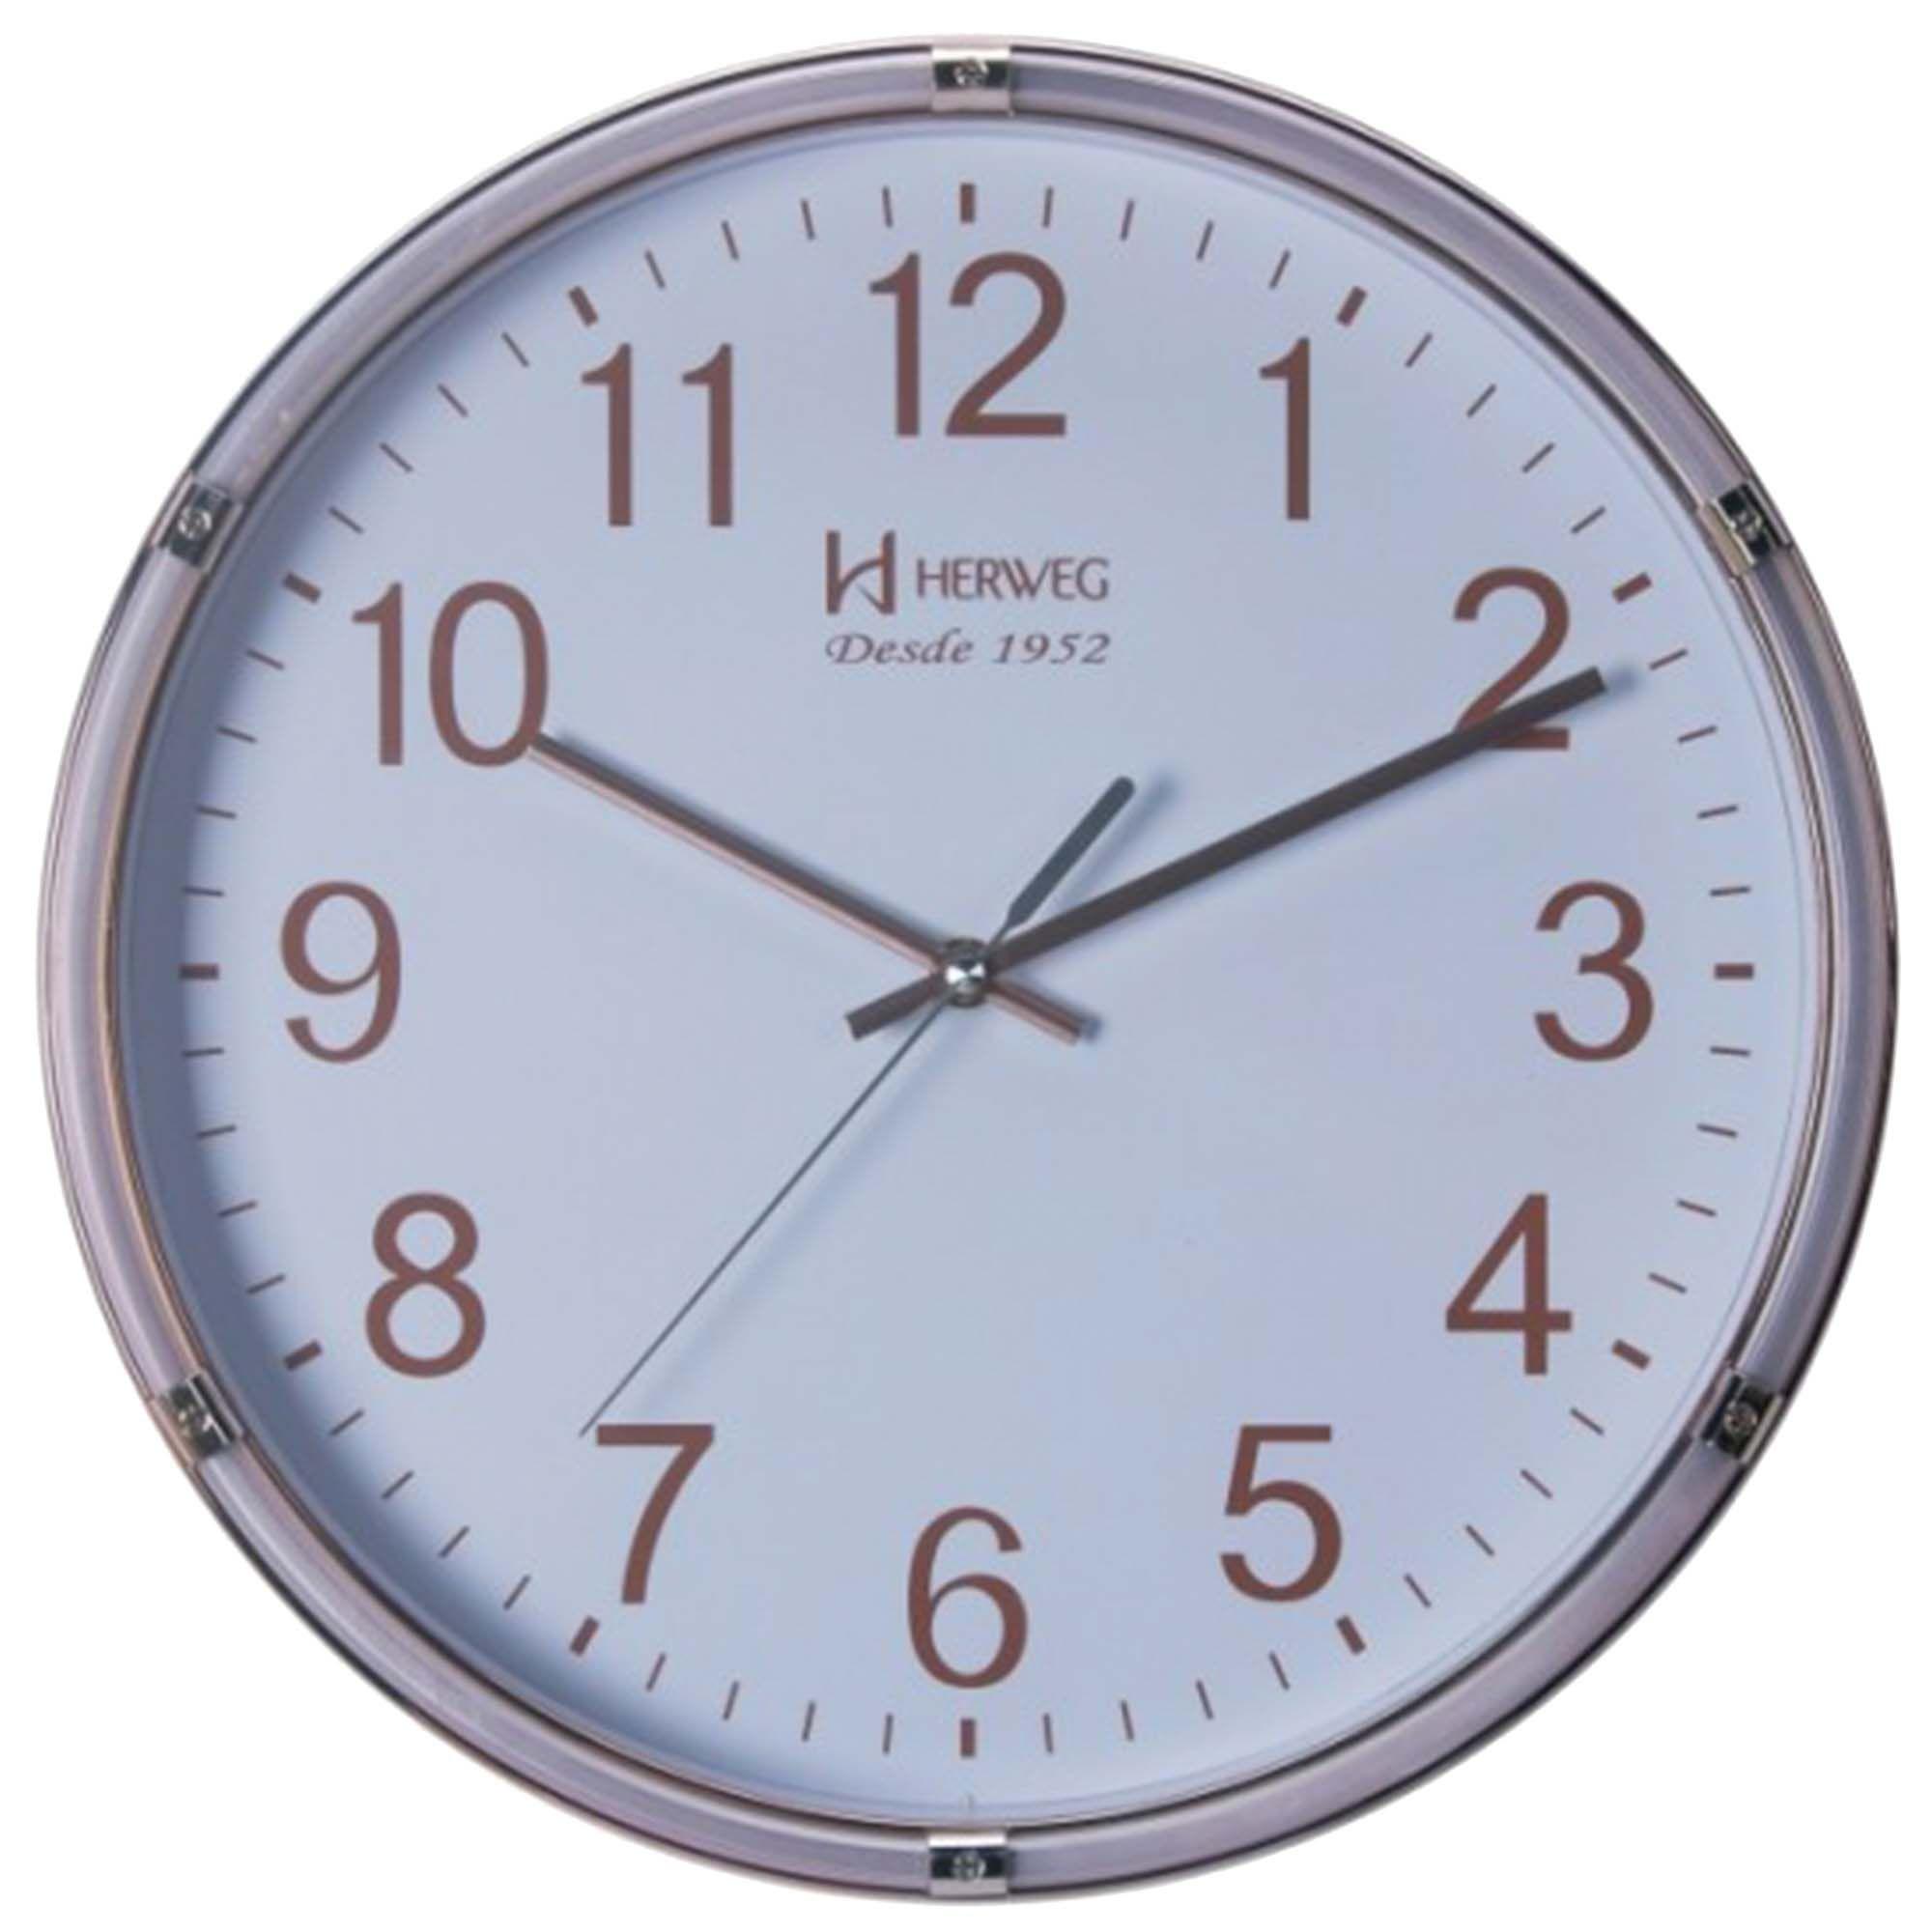 Relógio de Parede Analógico Herweg 6470 029 Dourado Claro